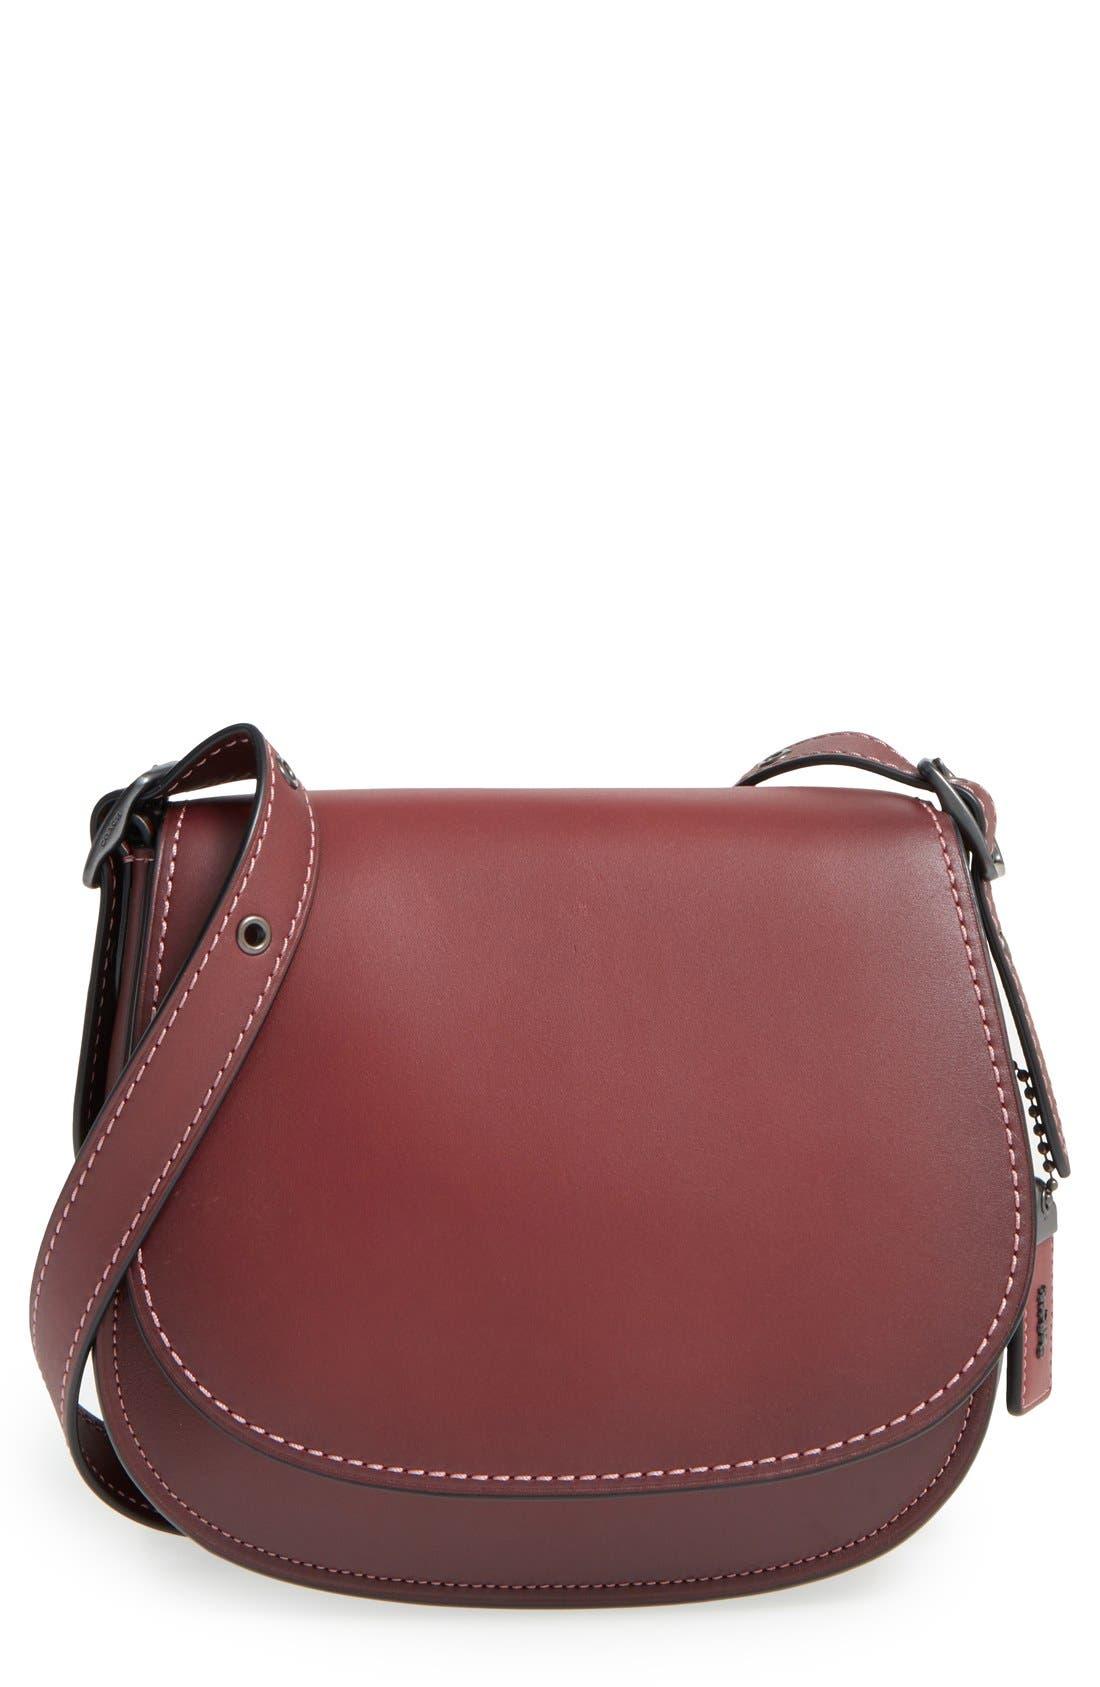 coach 1941 23 leather saddle bag nordstrom